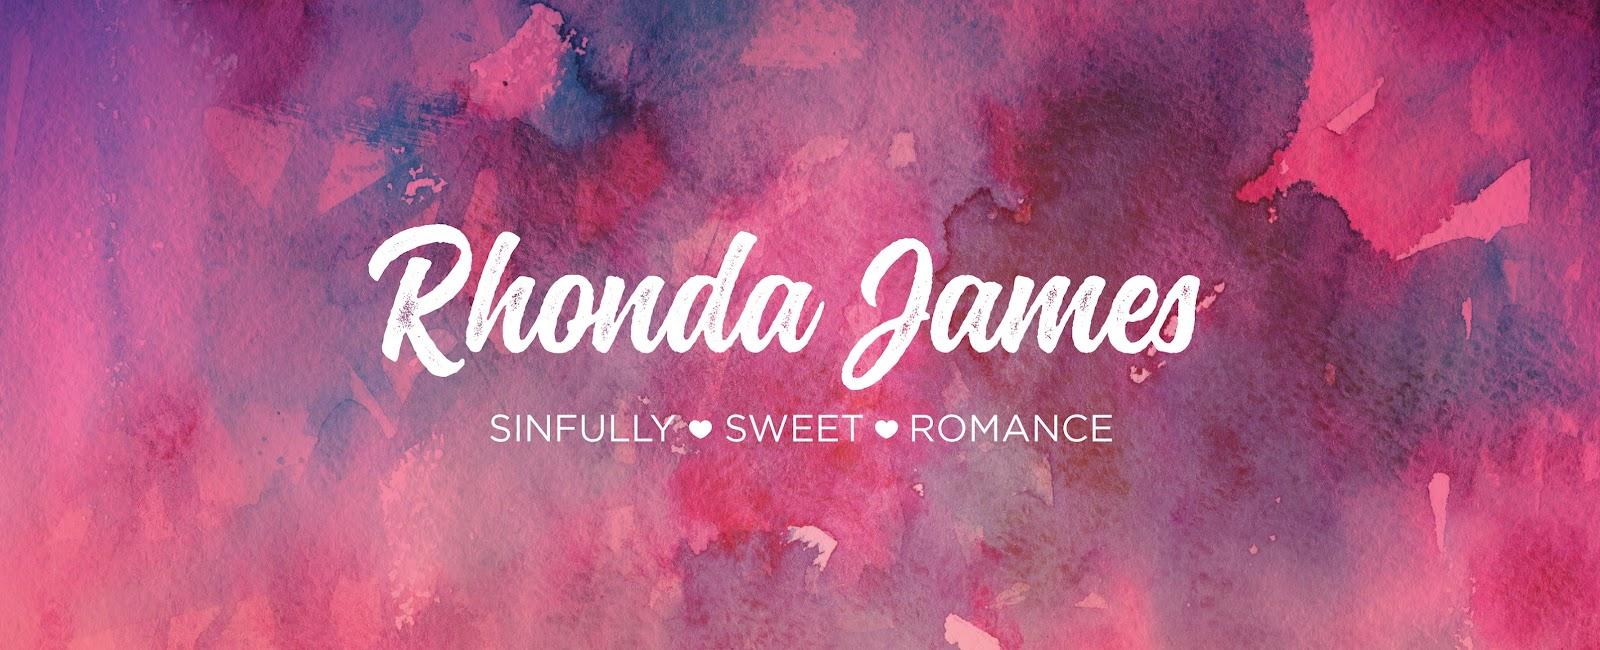 rhonda's banner 2.jpg